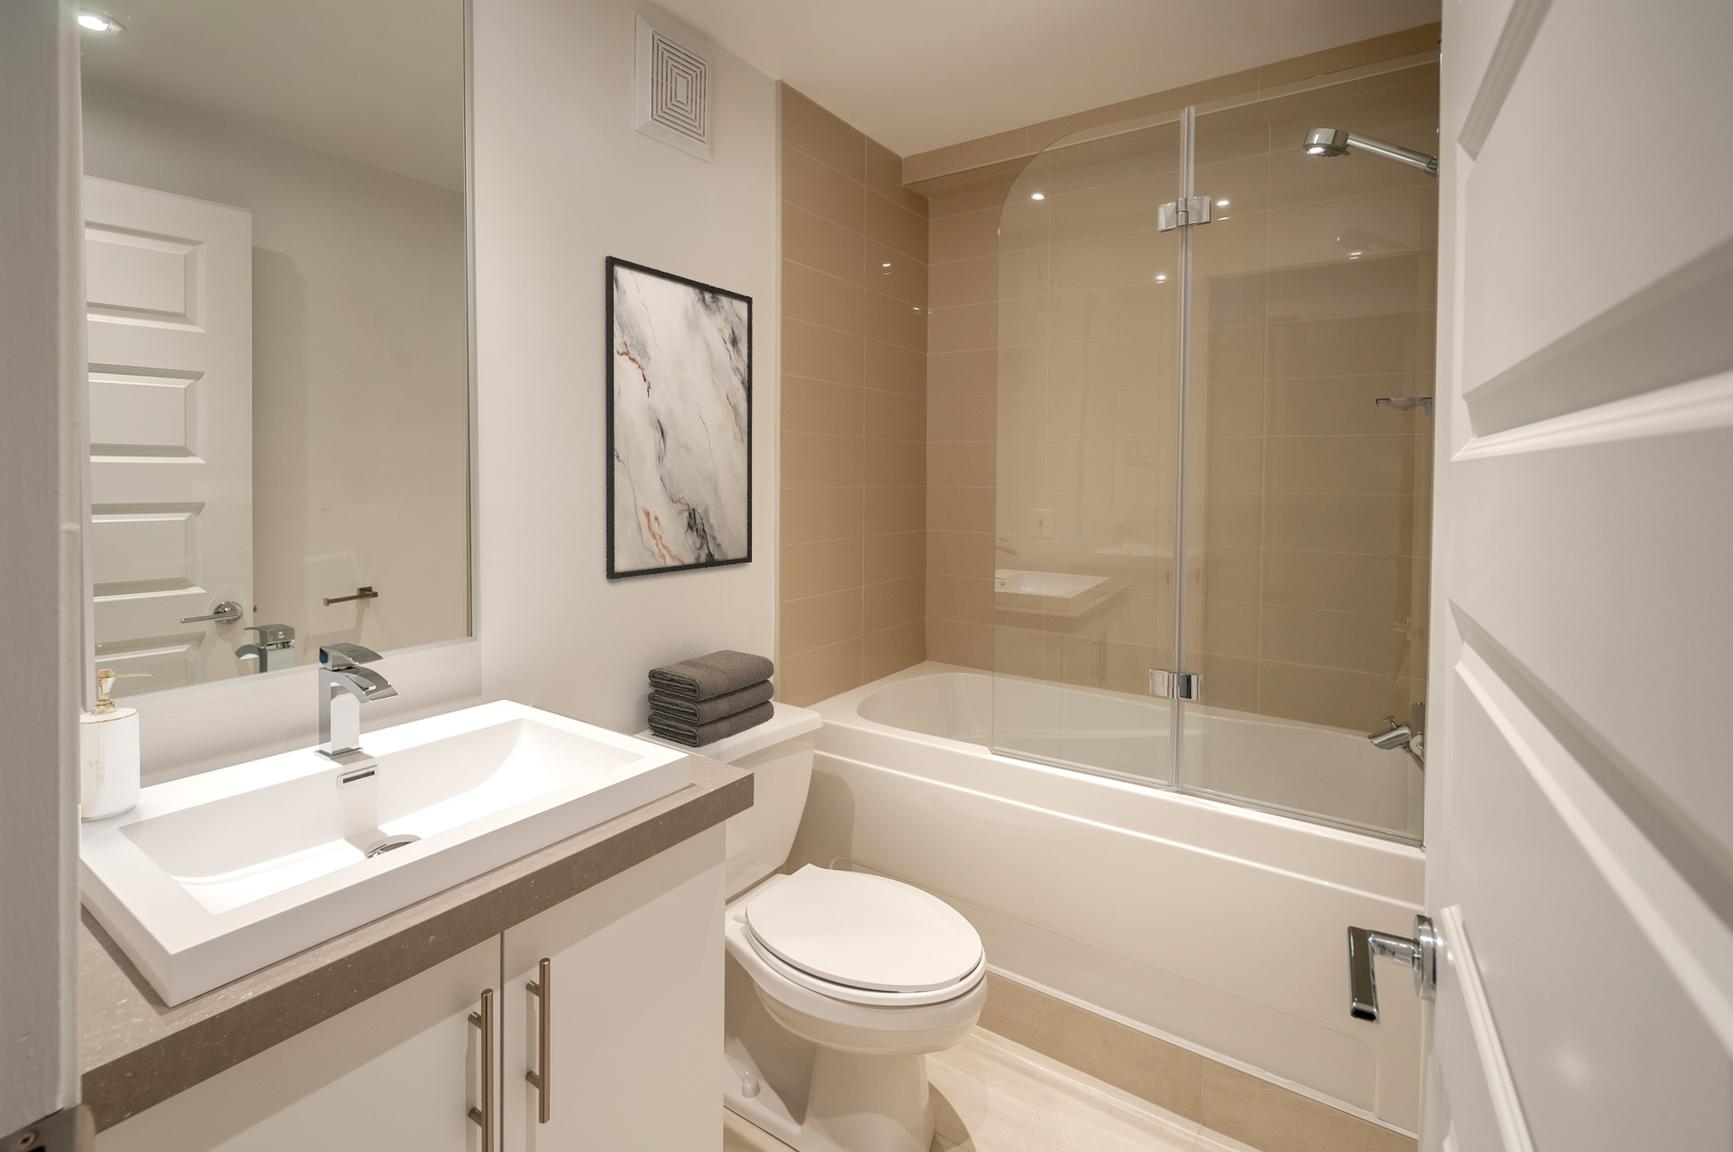 2 bedroom Apartments for rent in Quebec City at Les Jardins de Merici - Photo 20 - RentersPages – L407783